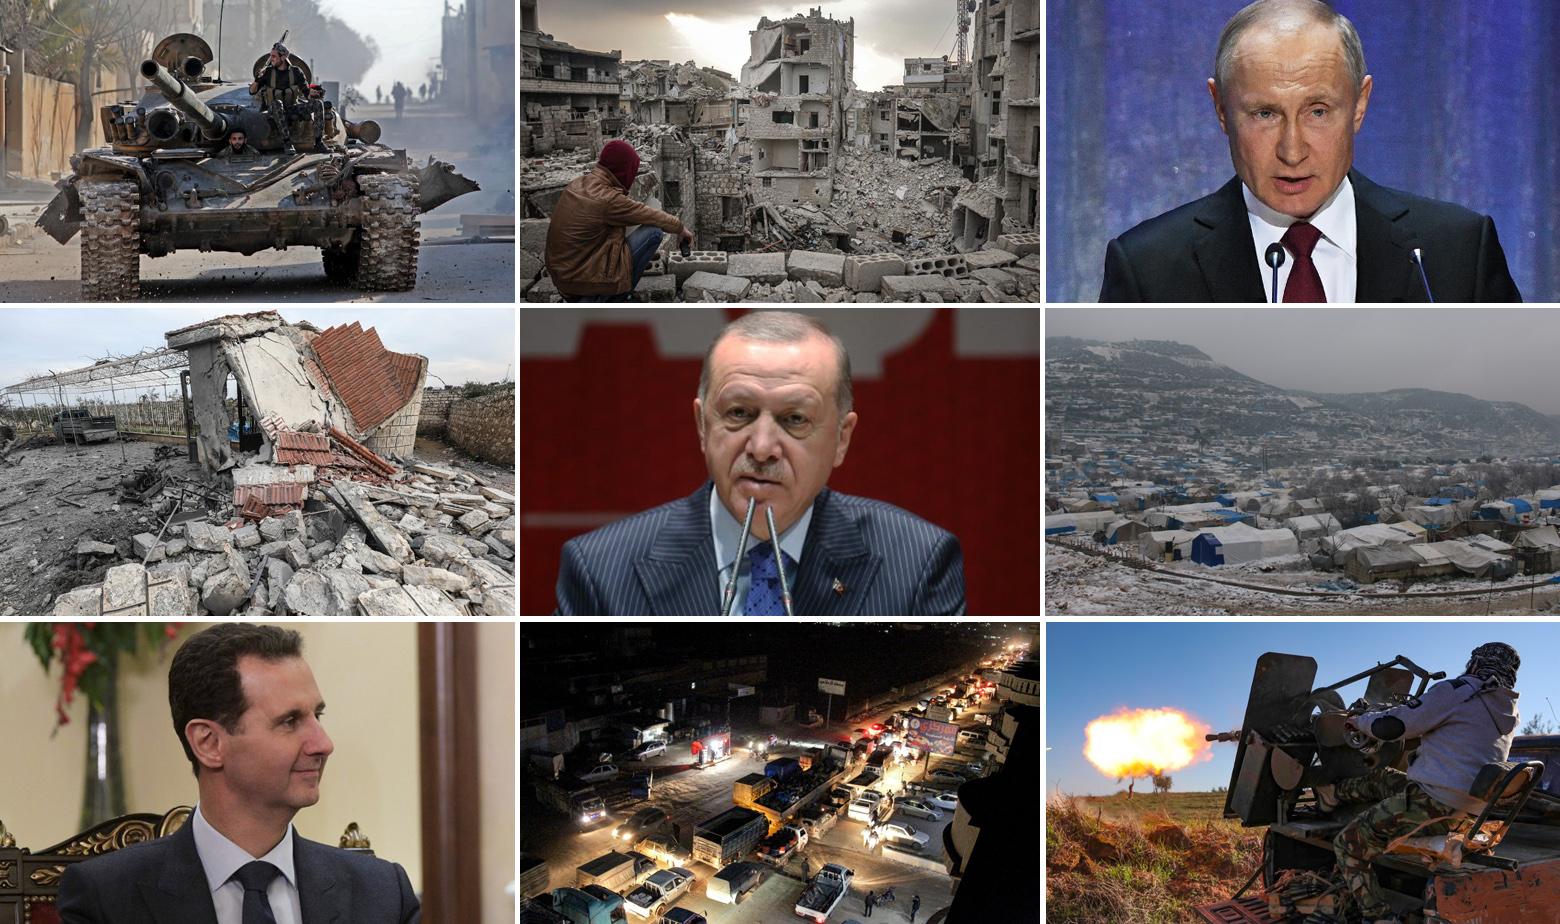 Bašar al-Asad, Recep Tayyip Erdogan, Vladimir Putin i prizori iz provincije Idlib (Sirija)